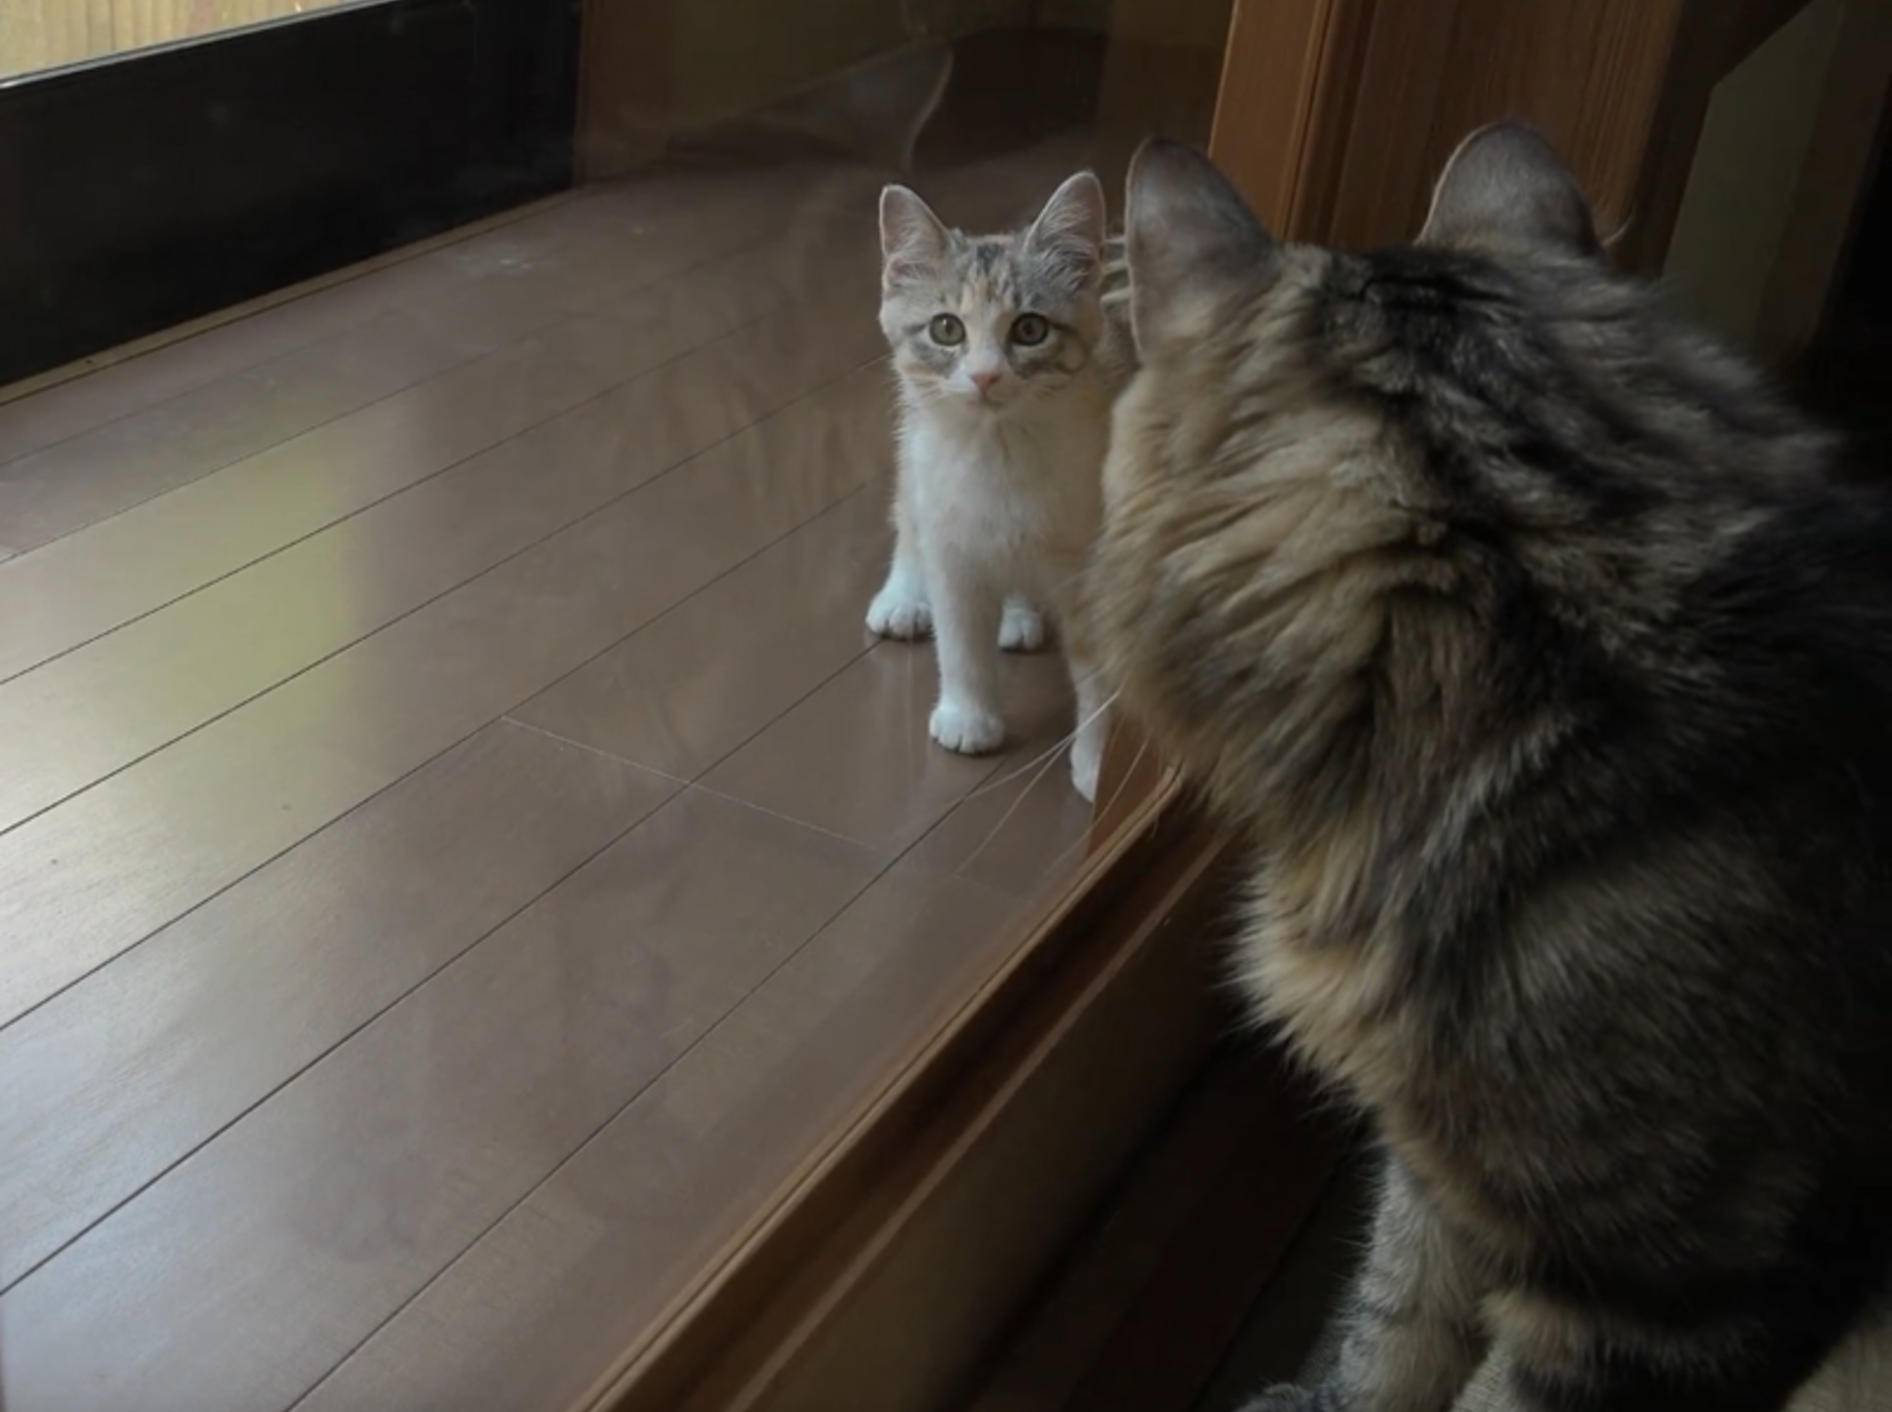 Katzen-WG in Japan bekommt Kätzchen-Zuwachs – YouTube / 10 Cats.